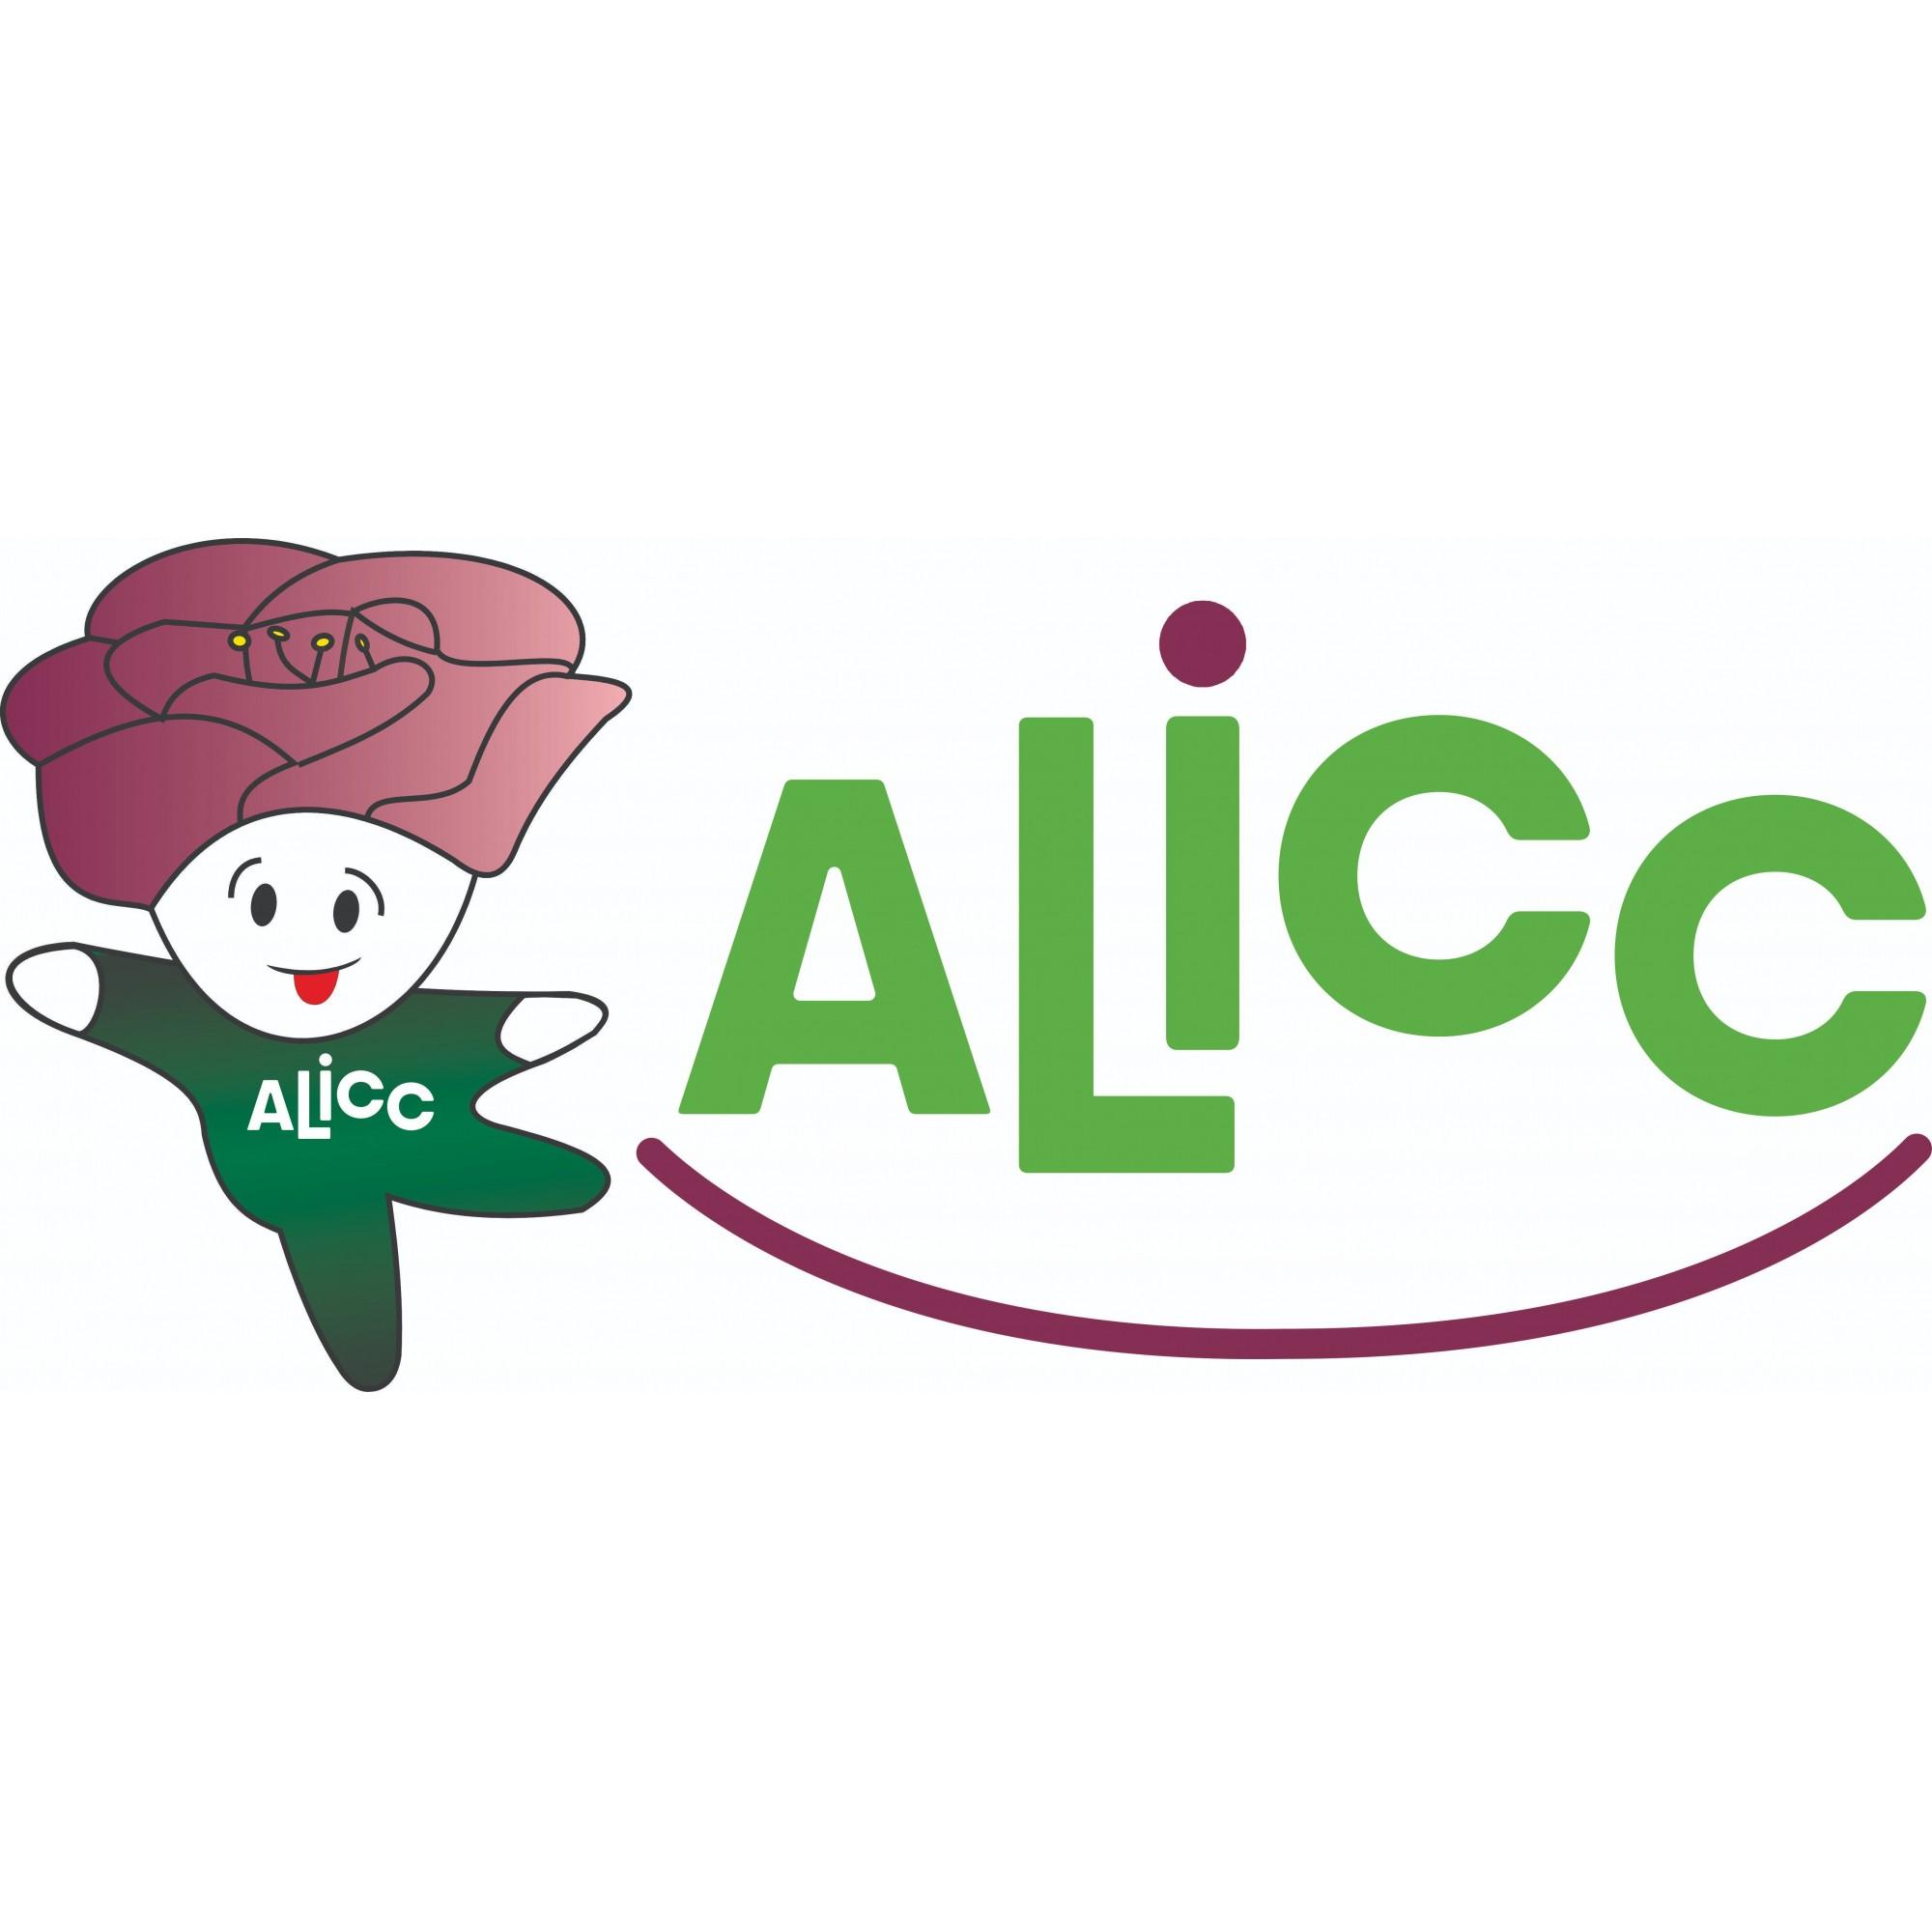 Kit com 3 Máscaras de pano - ALICC